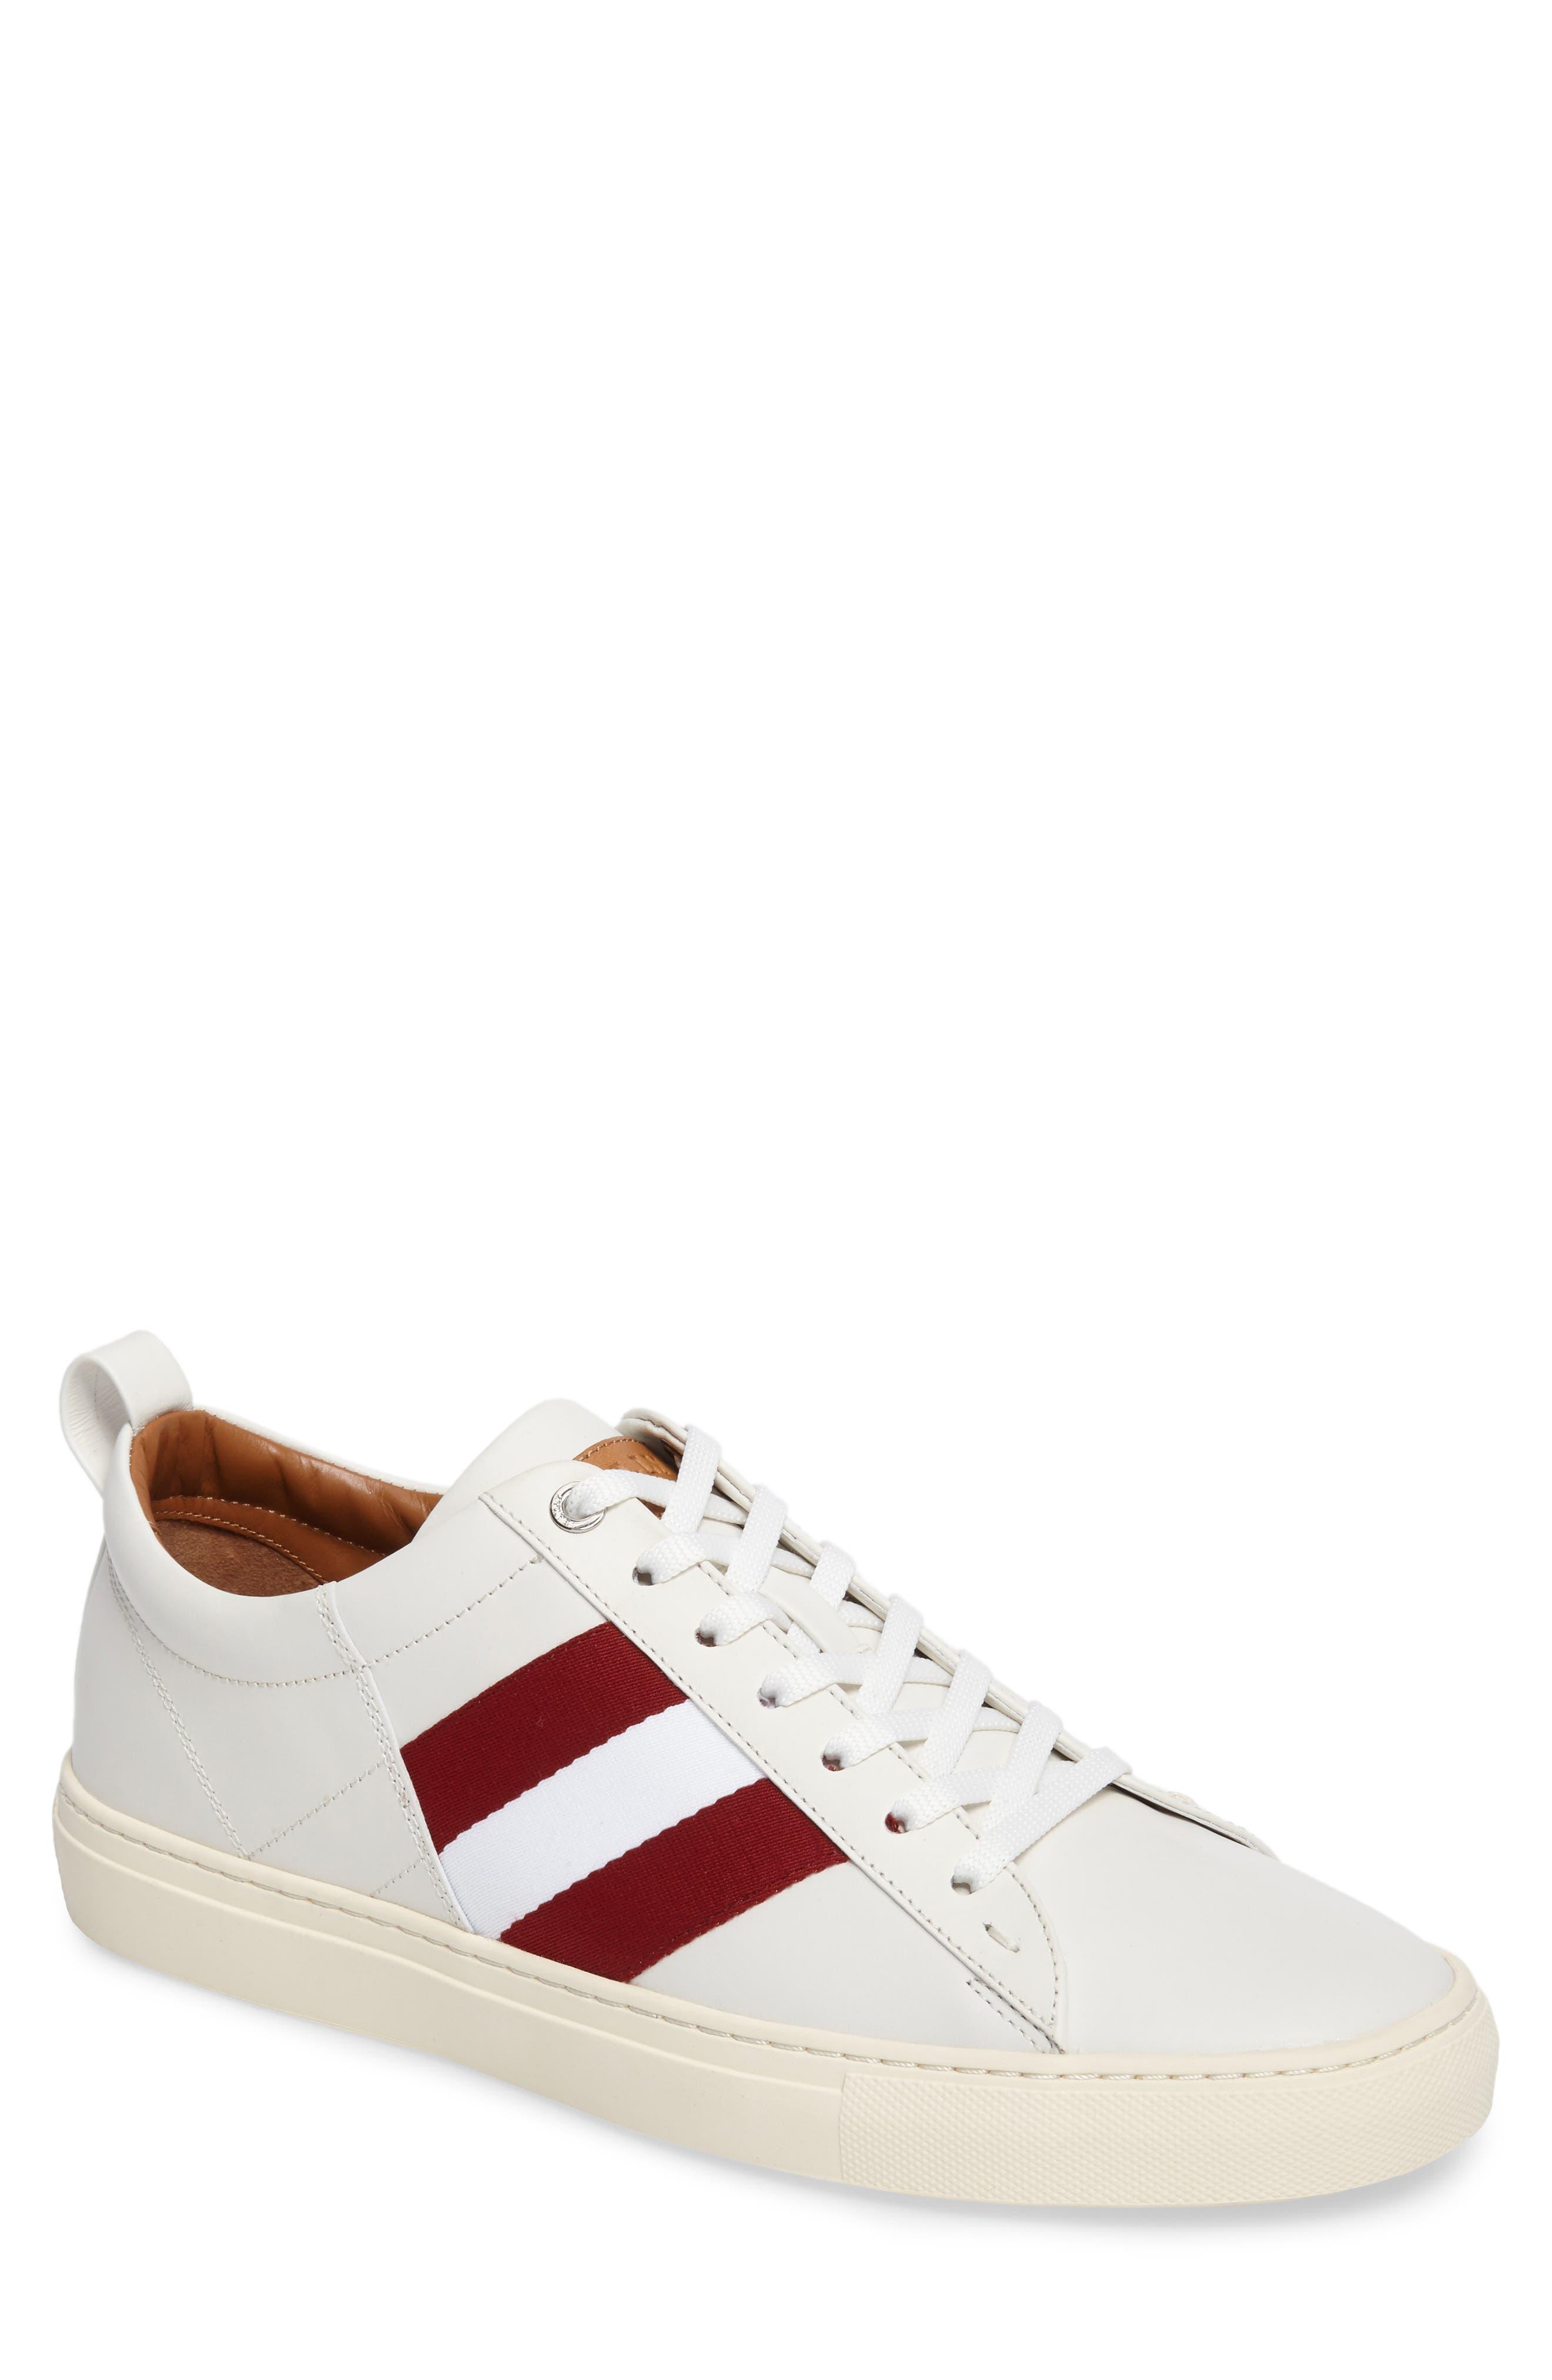 'Helvio' Sneaker,                             Main thumbnail 1, color,                             WHITE